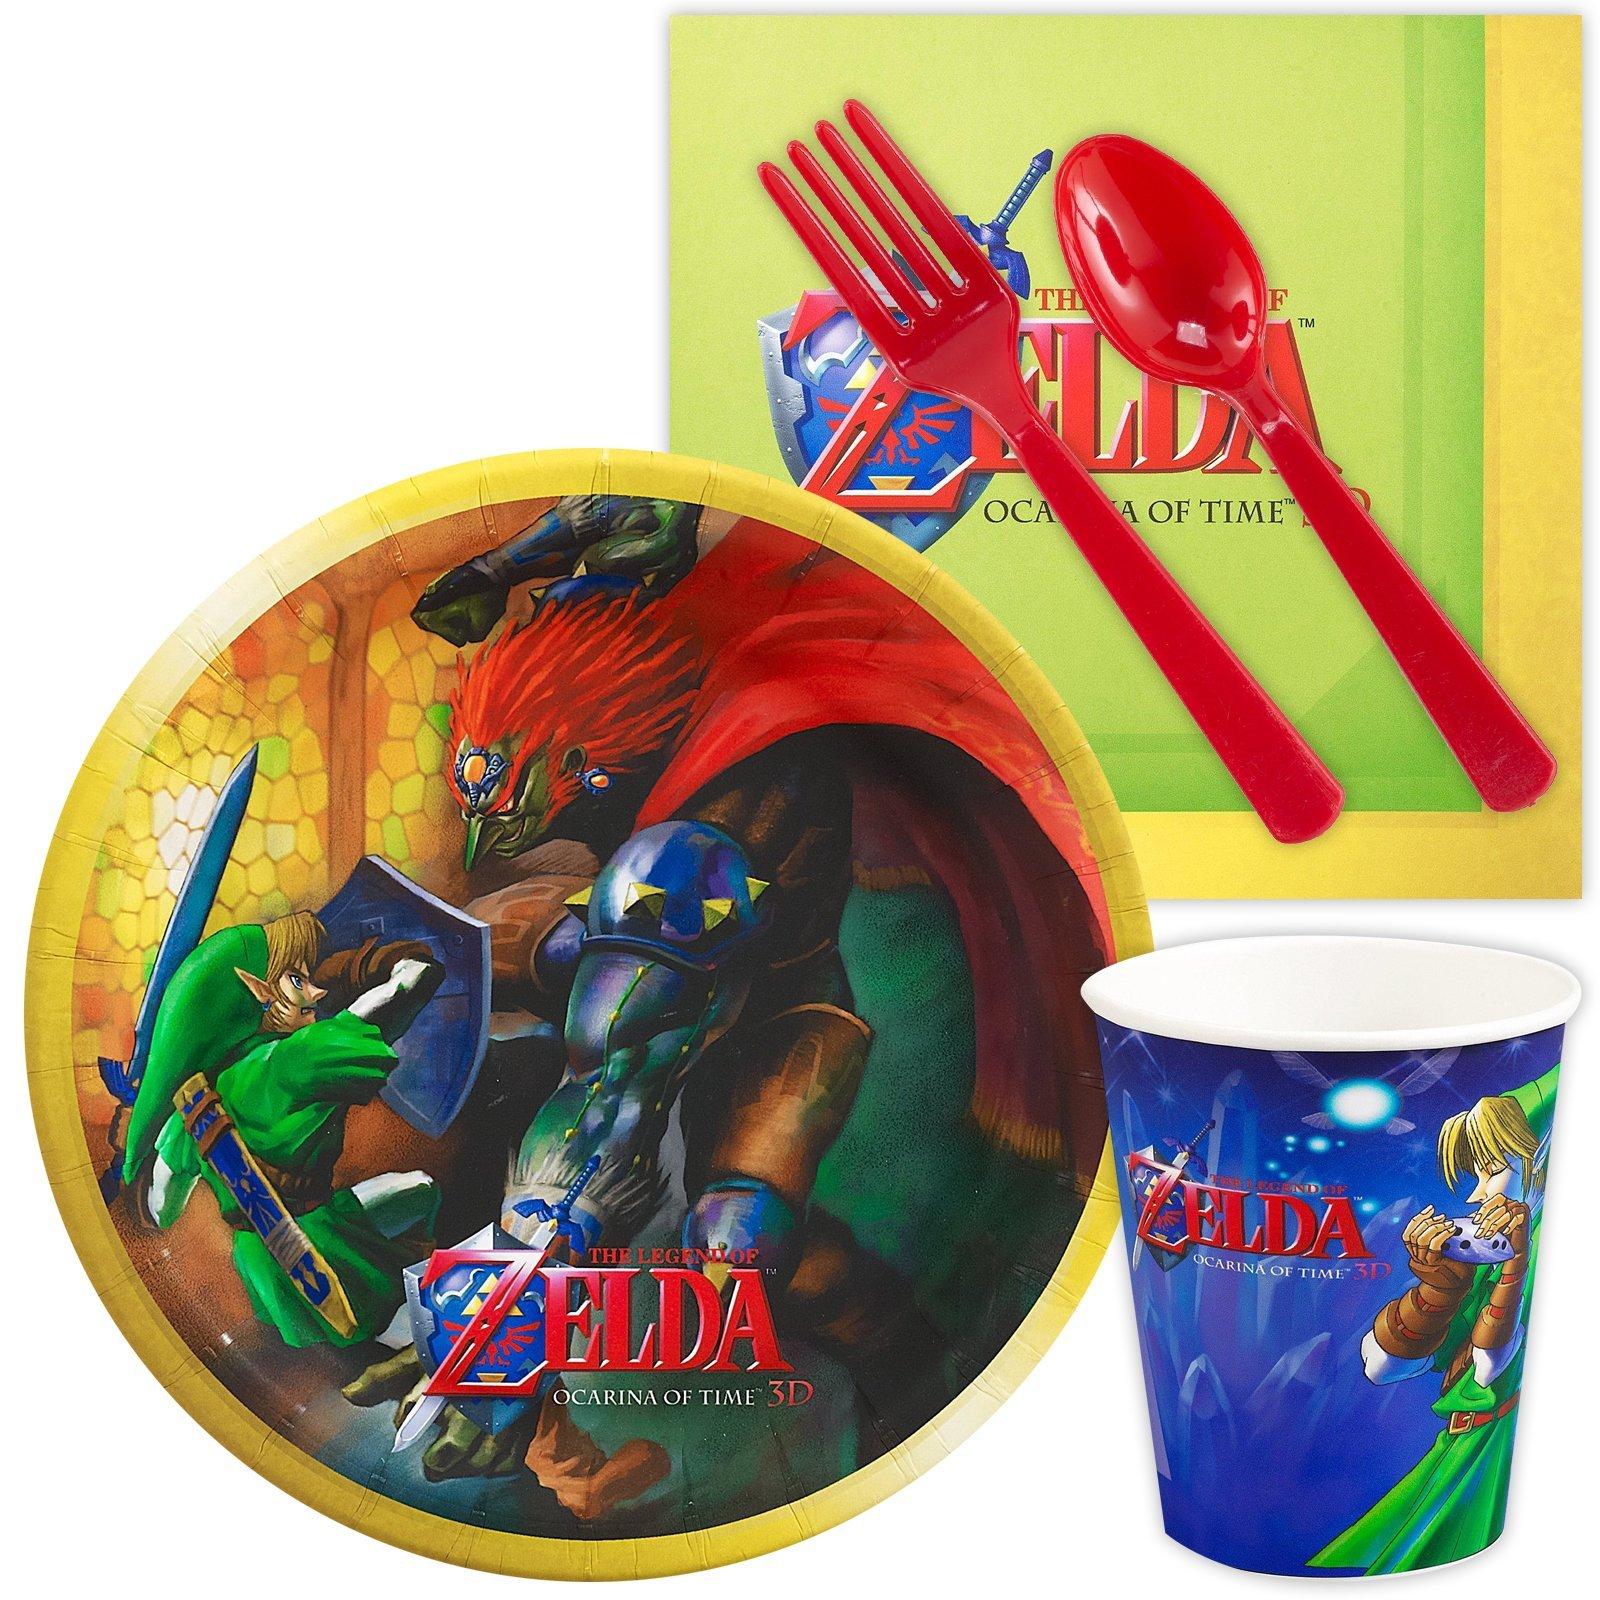 ZELDA Birthday Party Supplies Set Link Twilight Princess Ocarina of Time